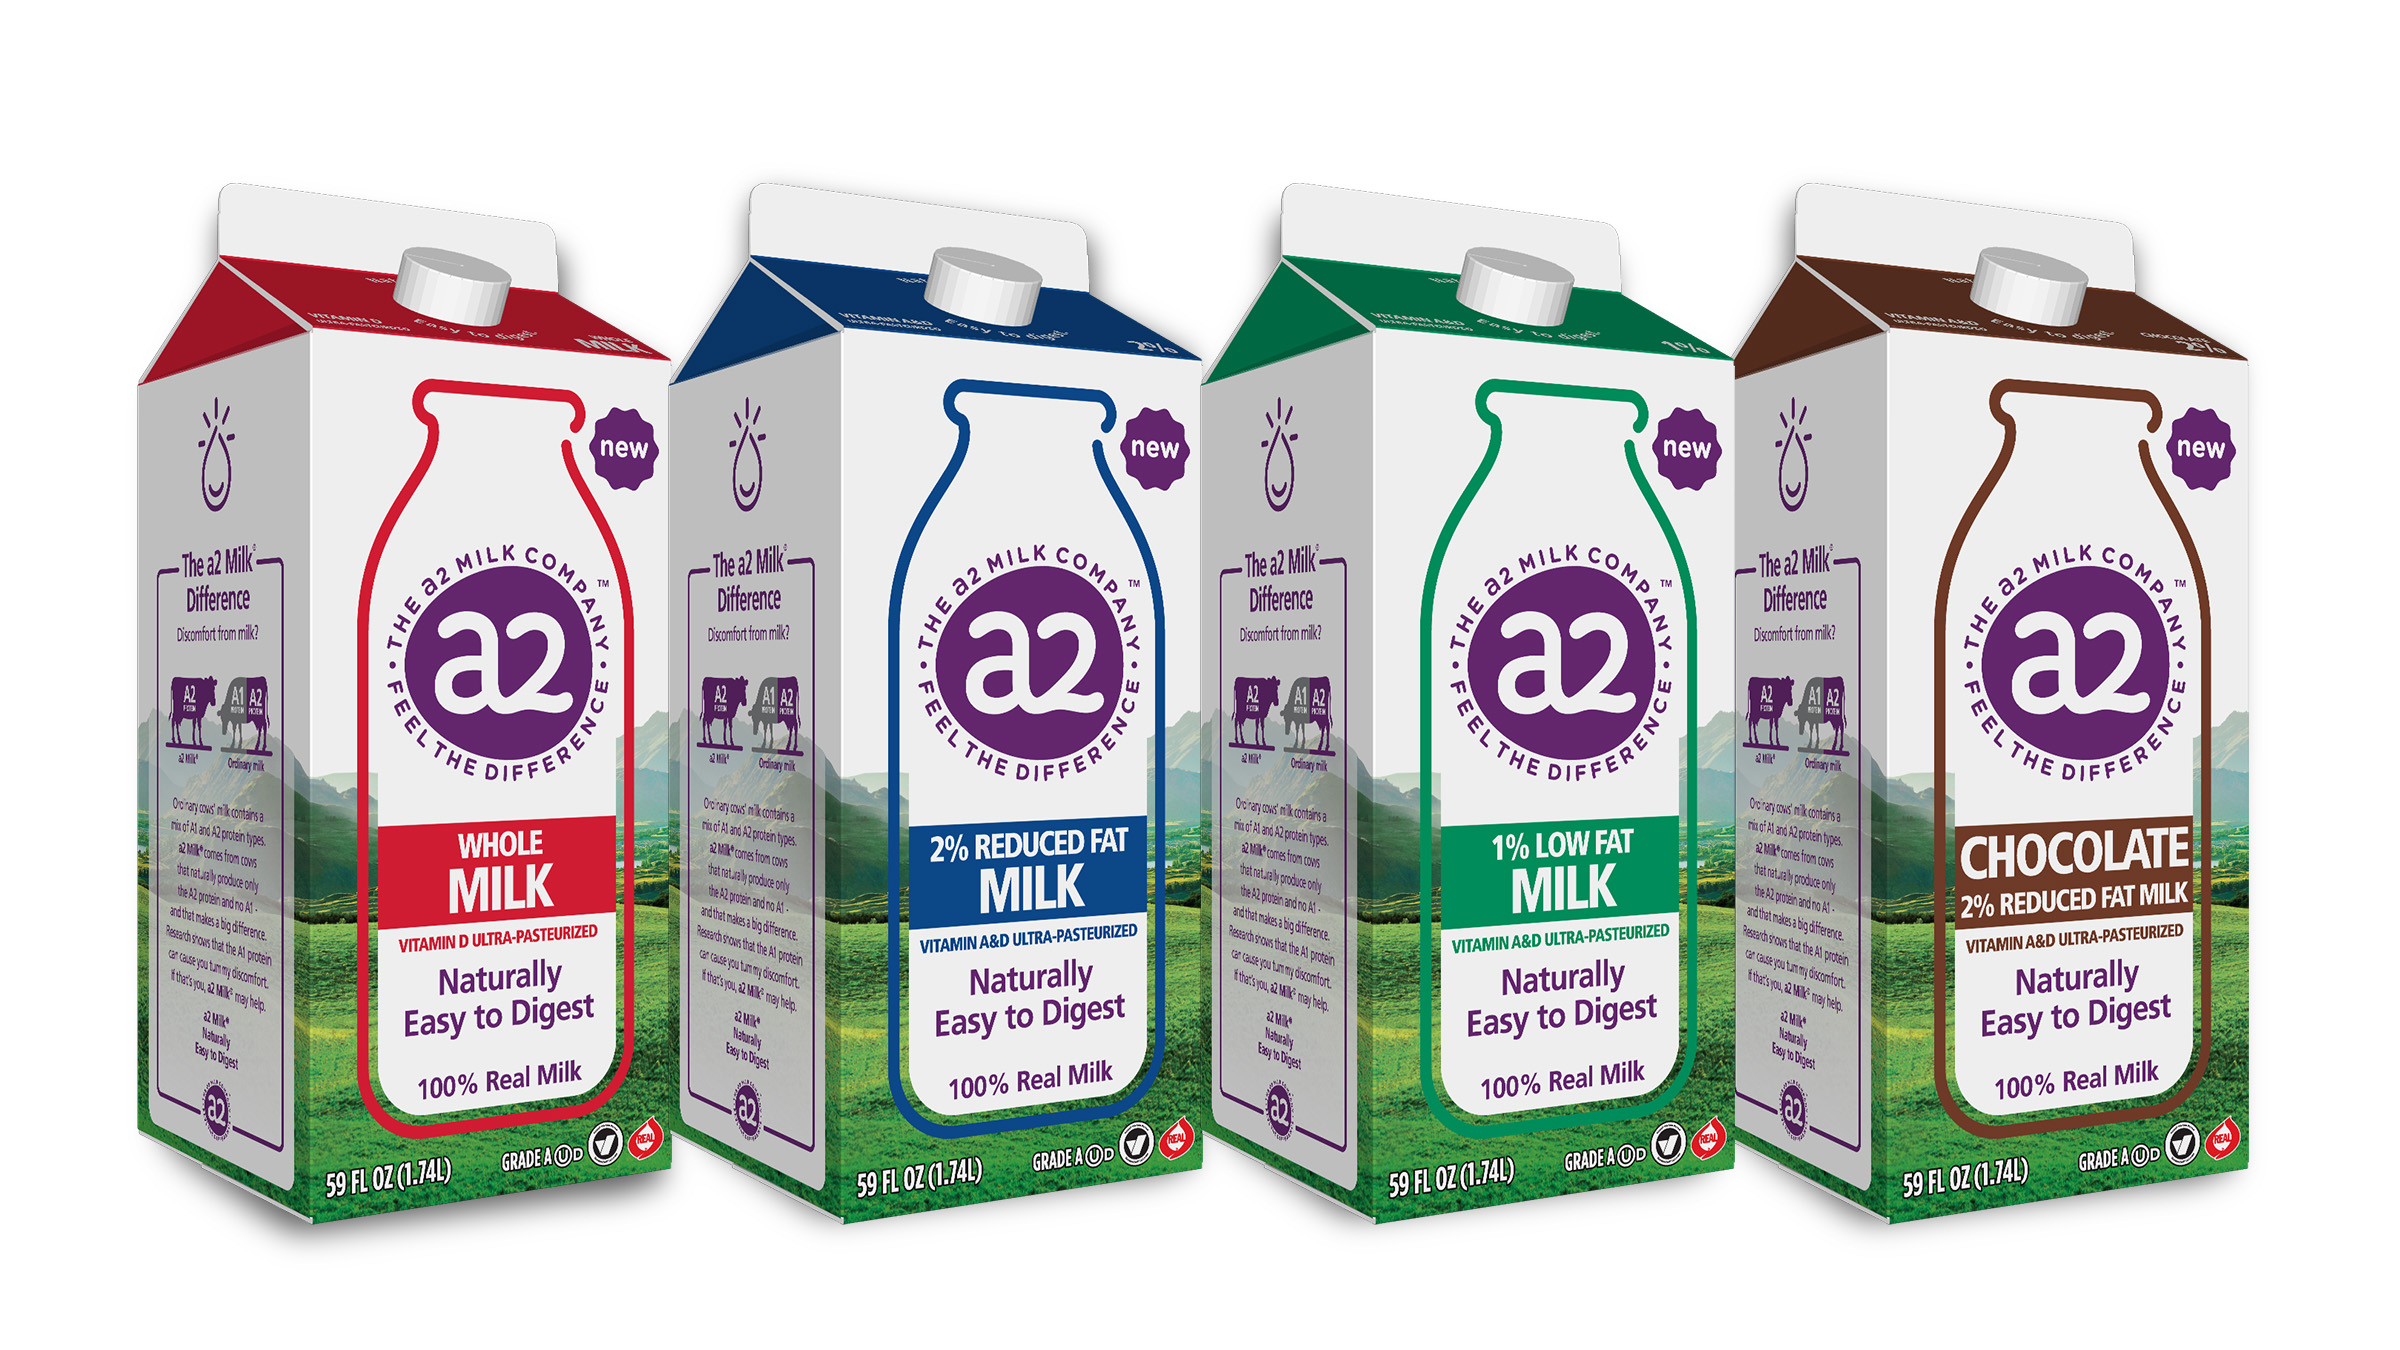 a2 Milk Company